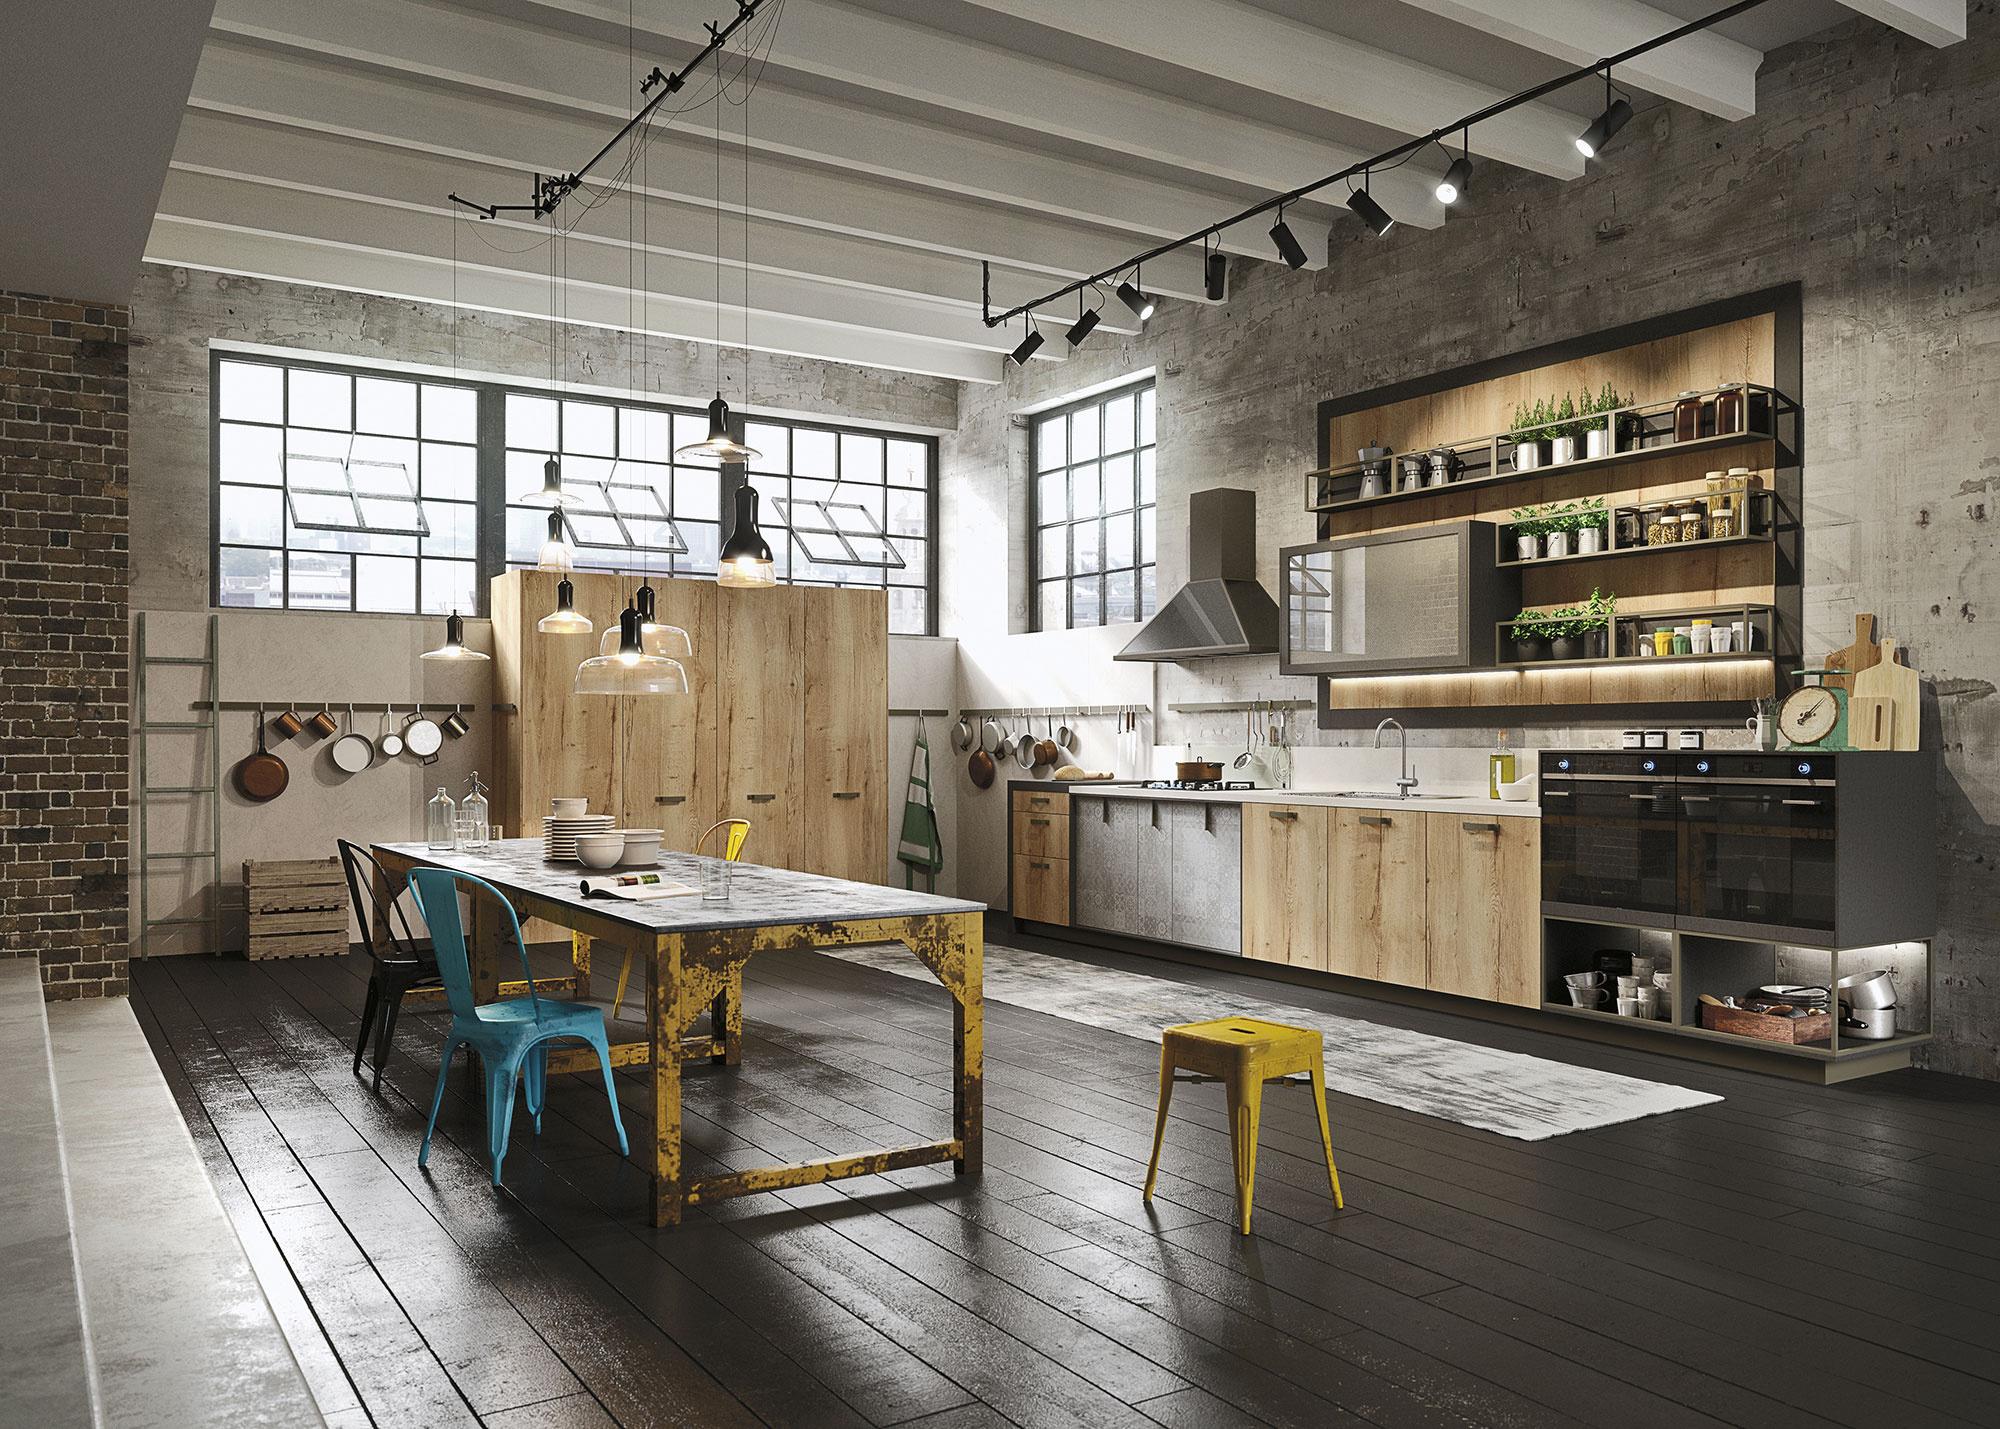 urban kitchen design ideas photo - 1